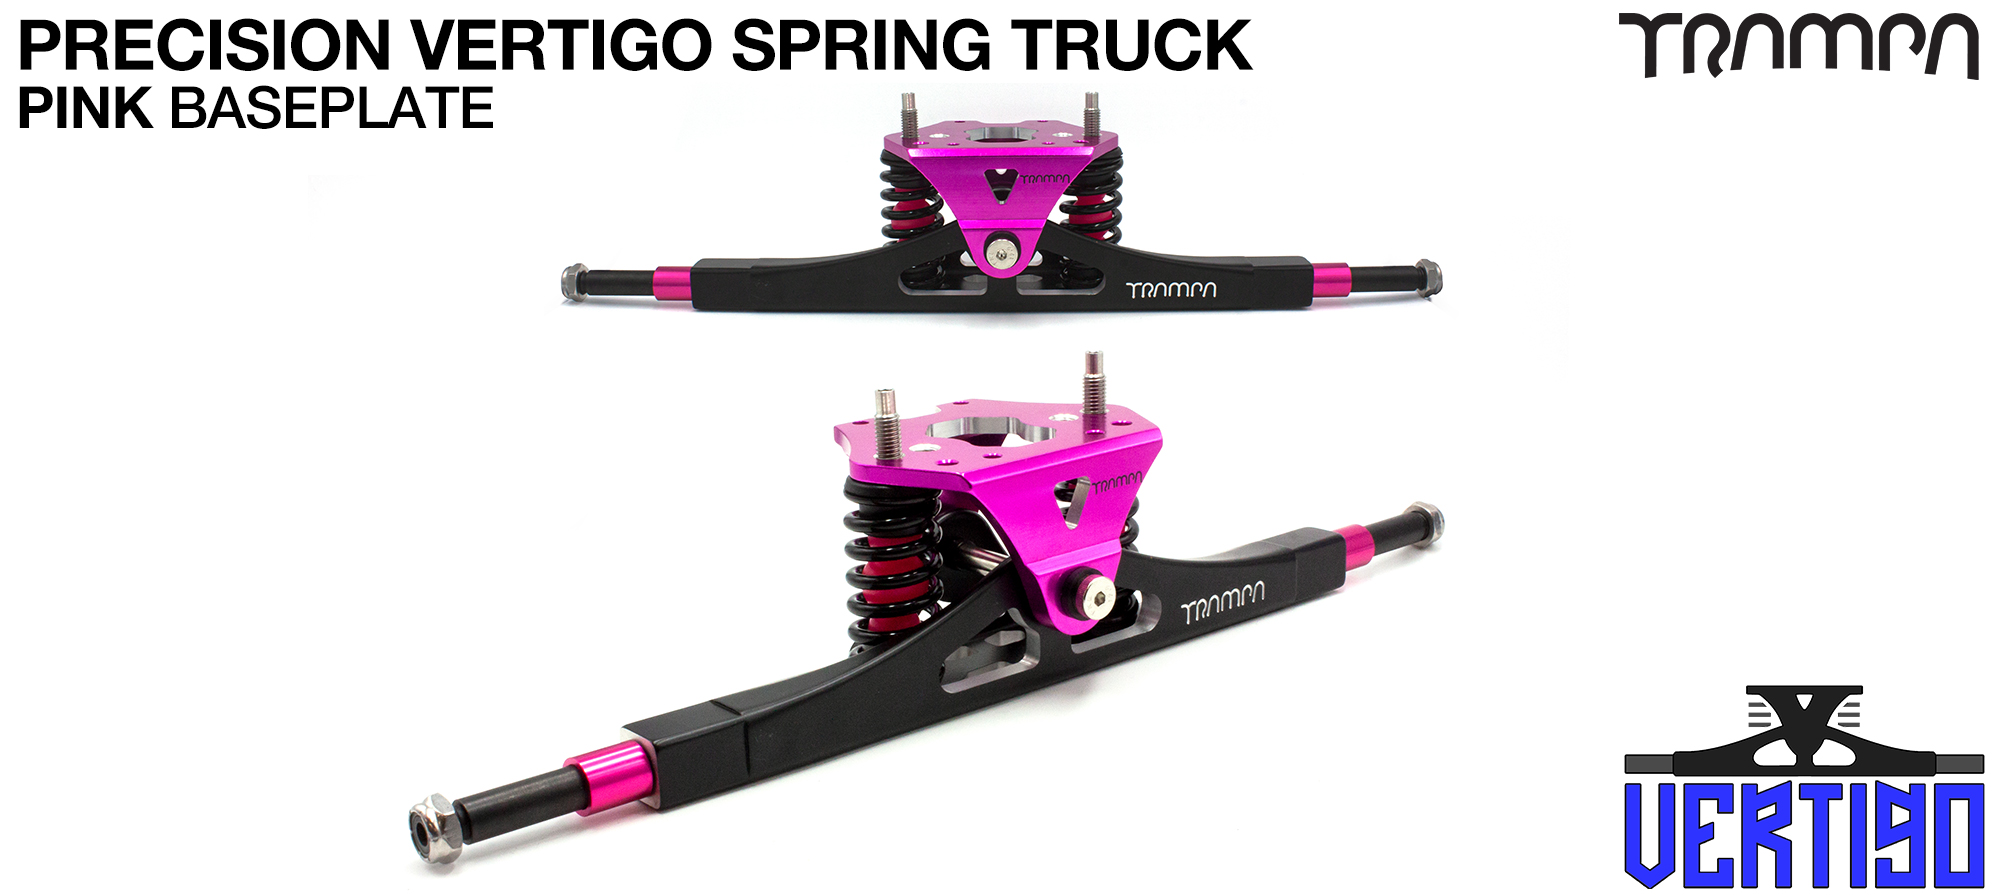 PRECISION CNC VERTIGO Truck PINK - 12mm Hollow Axles with GUNMETAL CNC baseplate Steel Kingpin TRAMPA Spring Trucks